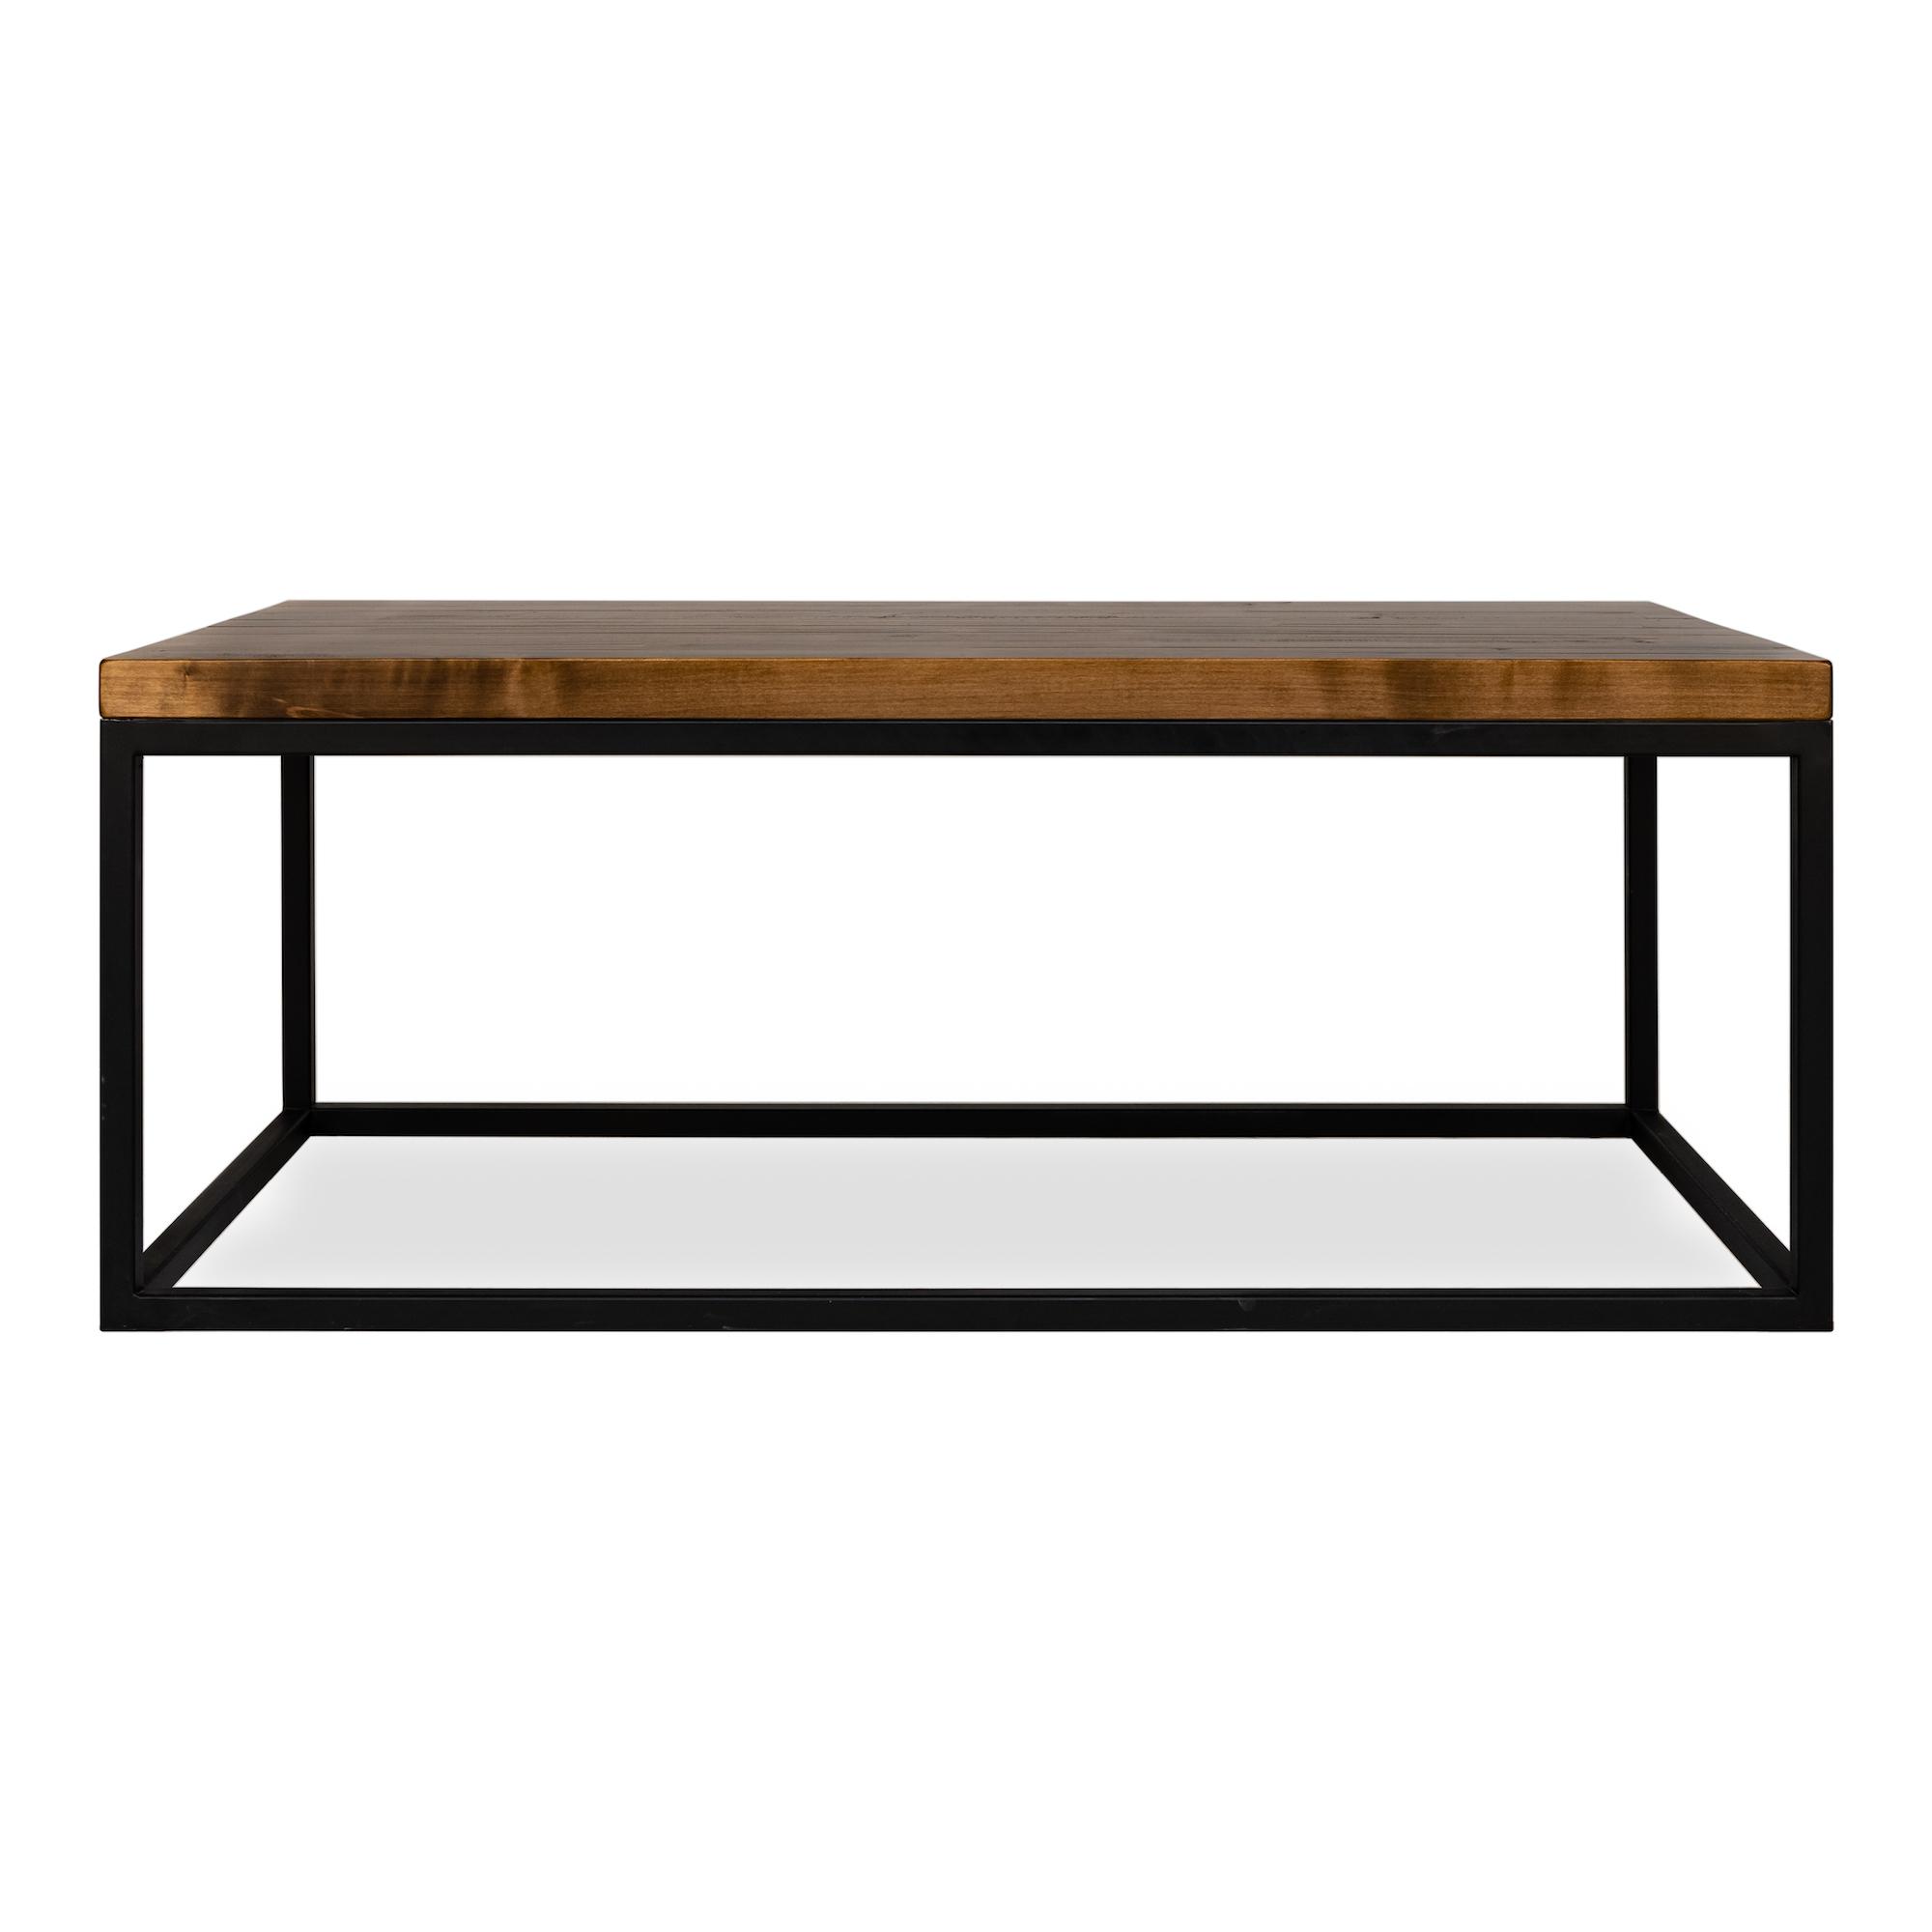 Woodcraft_Furniture_TubularCoffeeTable-2-1.jpg